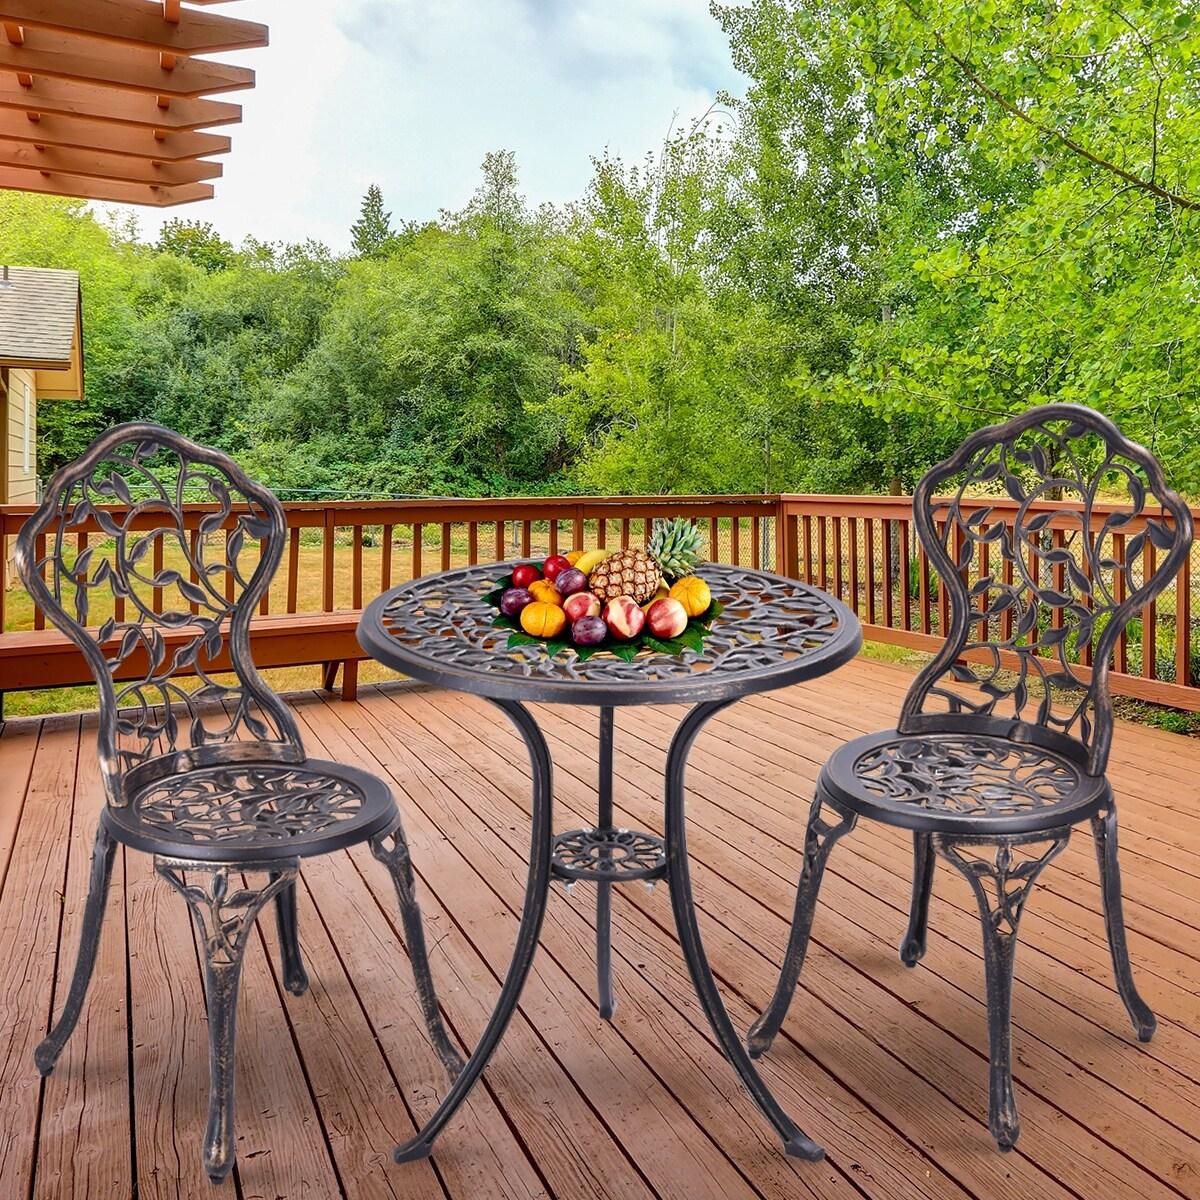 Costway outdoor patio furniture leaf design cast aluminum bistro set antique copper as pic